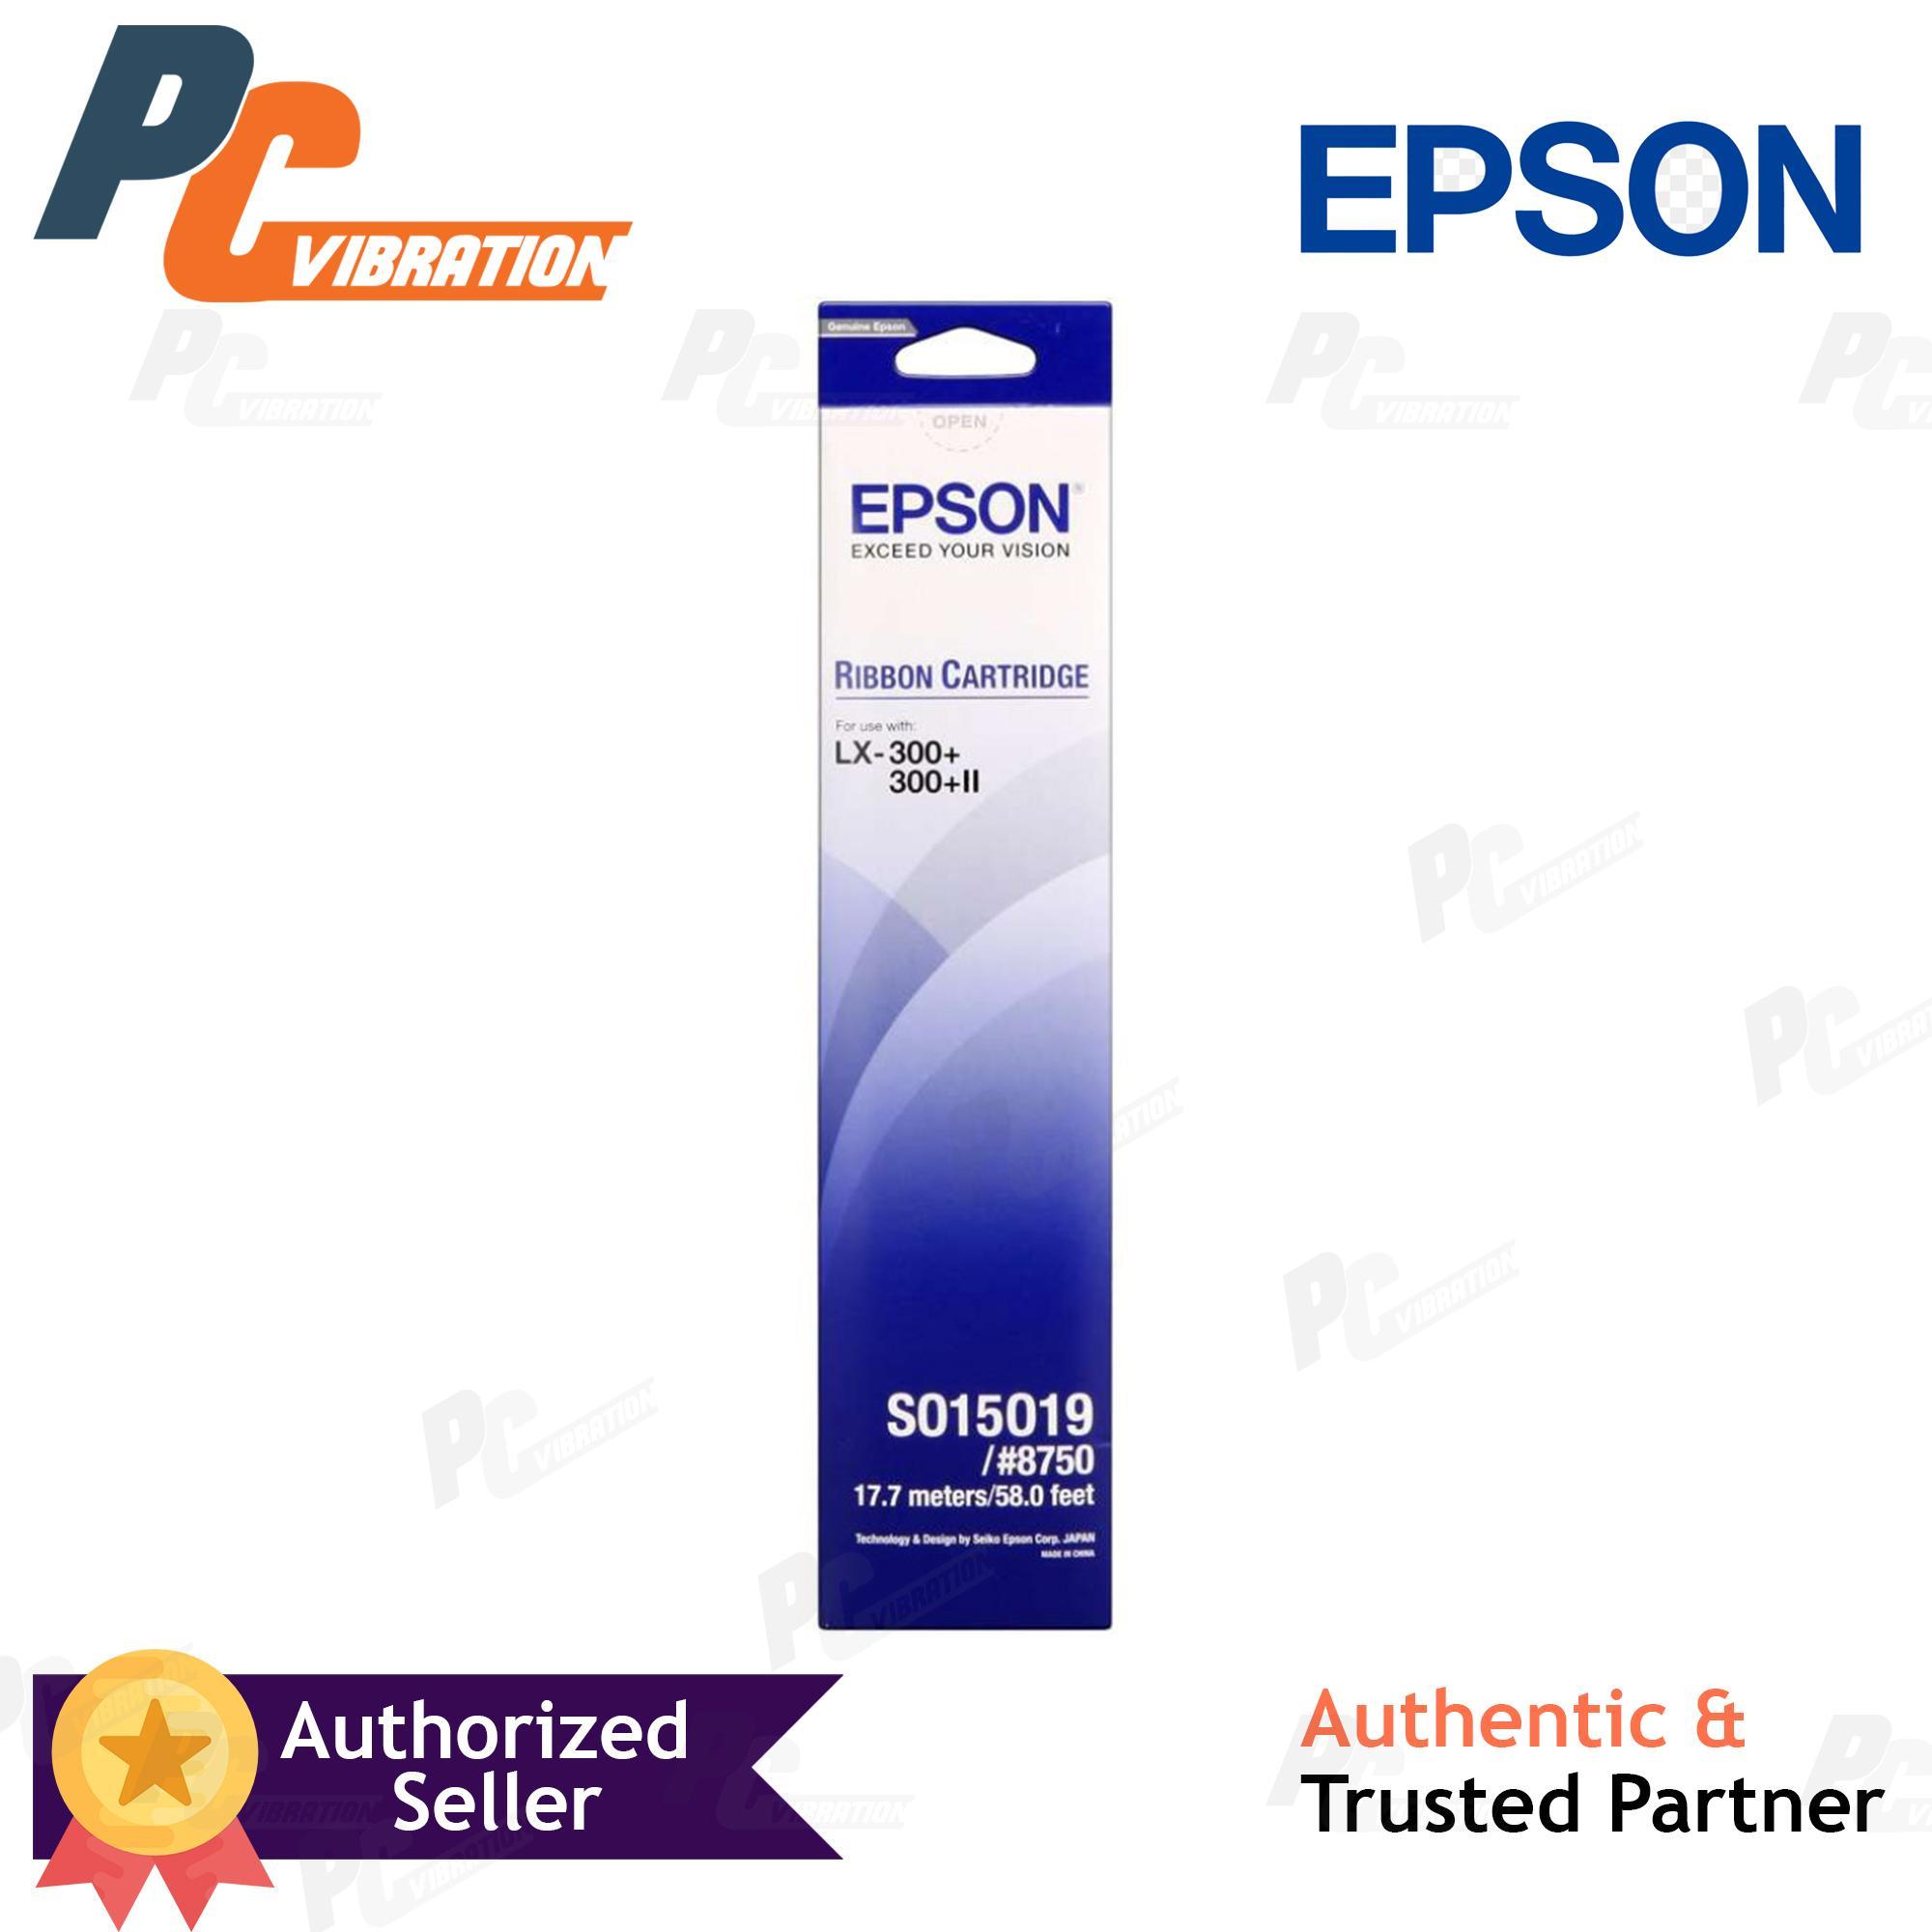 Harga Jual Epson Philippines Epson Dot Matrix Printer For Prices